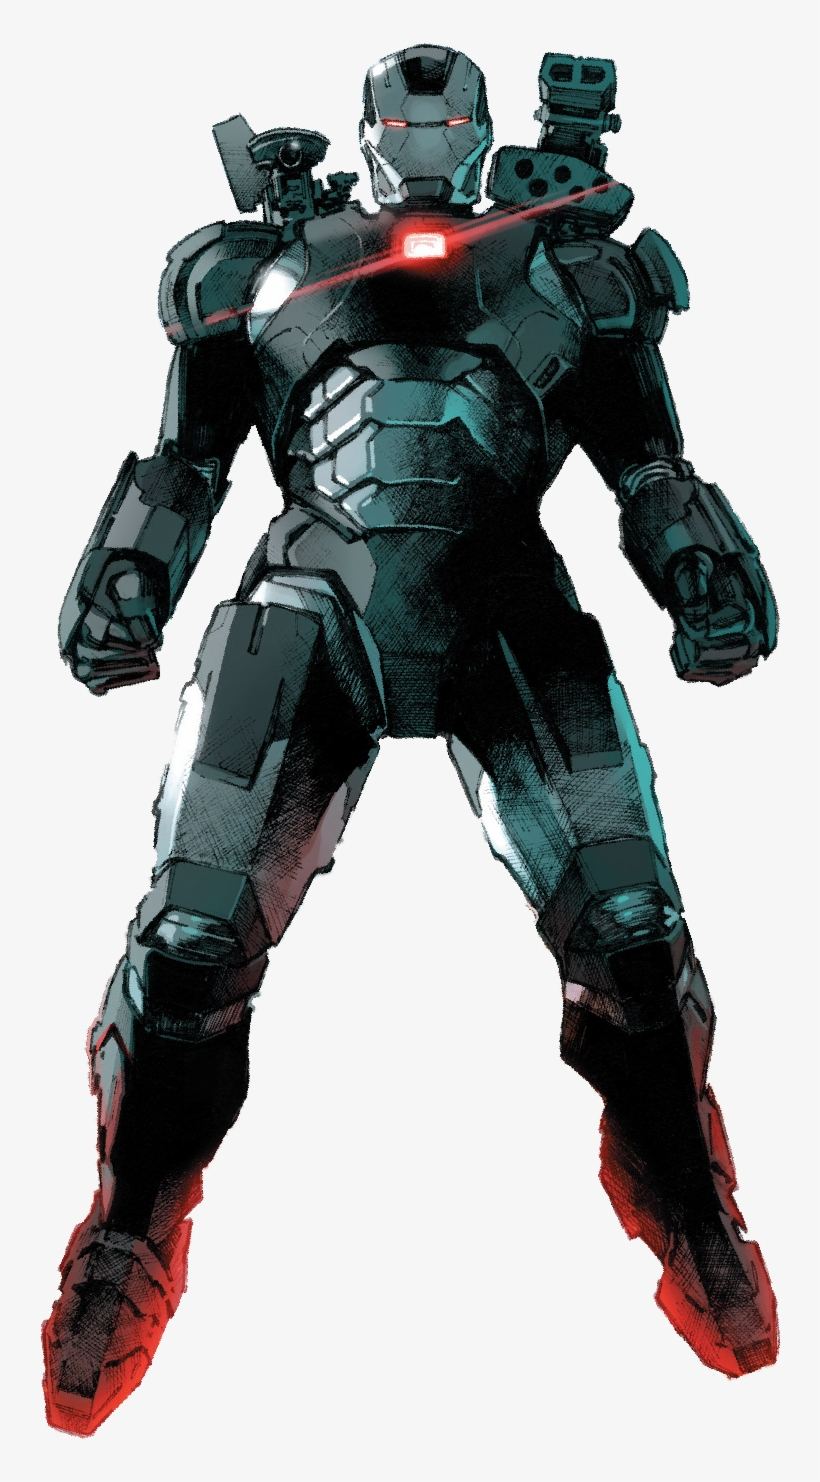 Fantasy Armor, War Machine, Marvel Dc Comics, Armors, - War Machine, transparent png #8969299